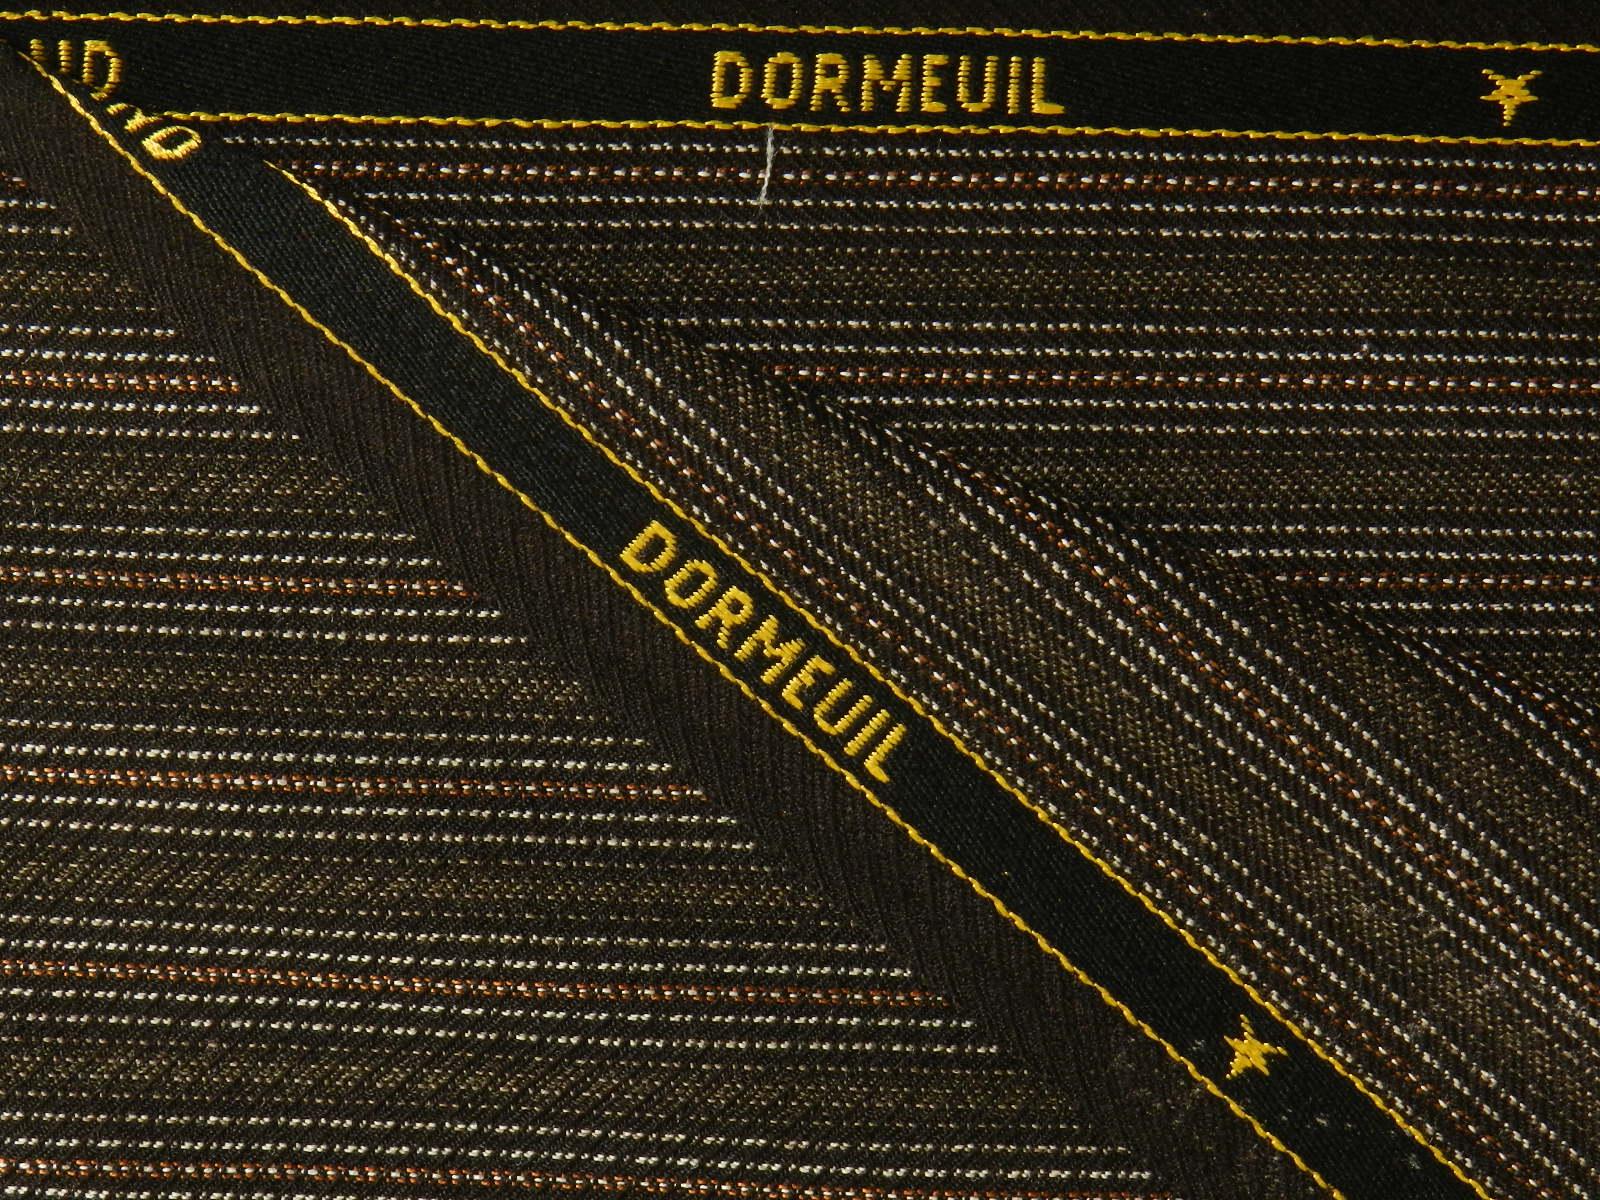 DORMEUIL(ドーメル) / ENGLAND / ブラウン 系 / ストライプ 系